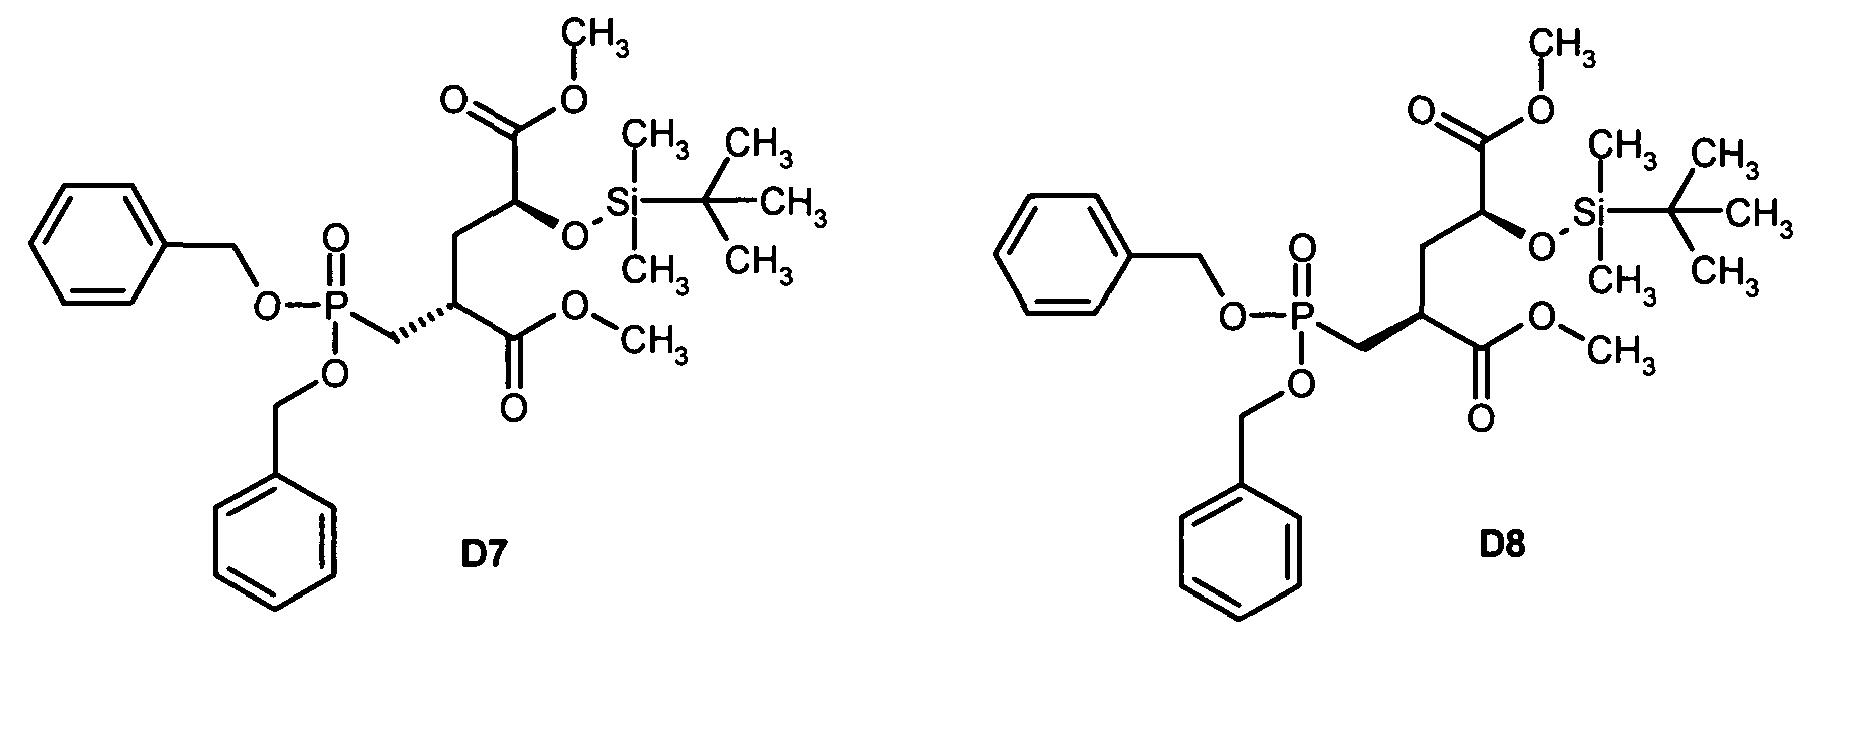 Peptide Bonding between Amino Acids  Boundless